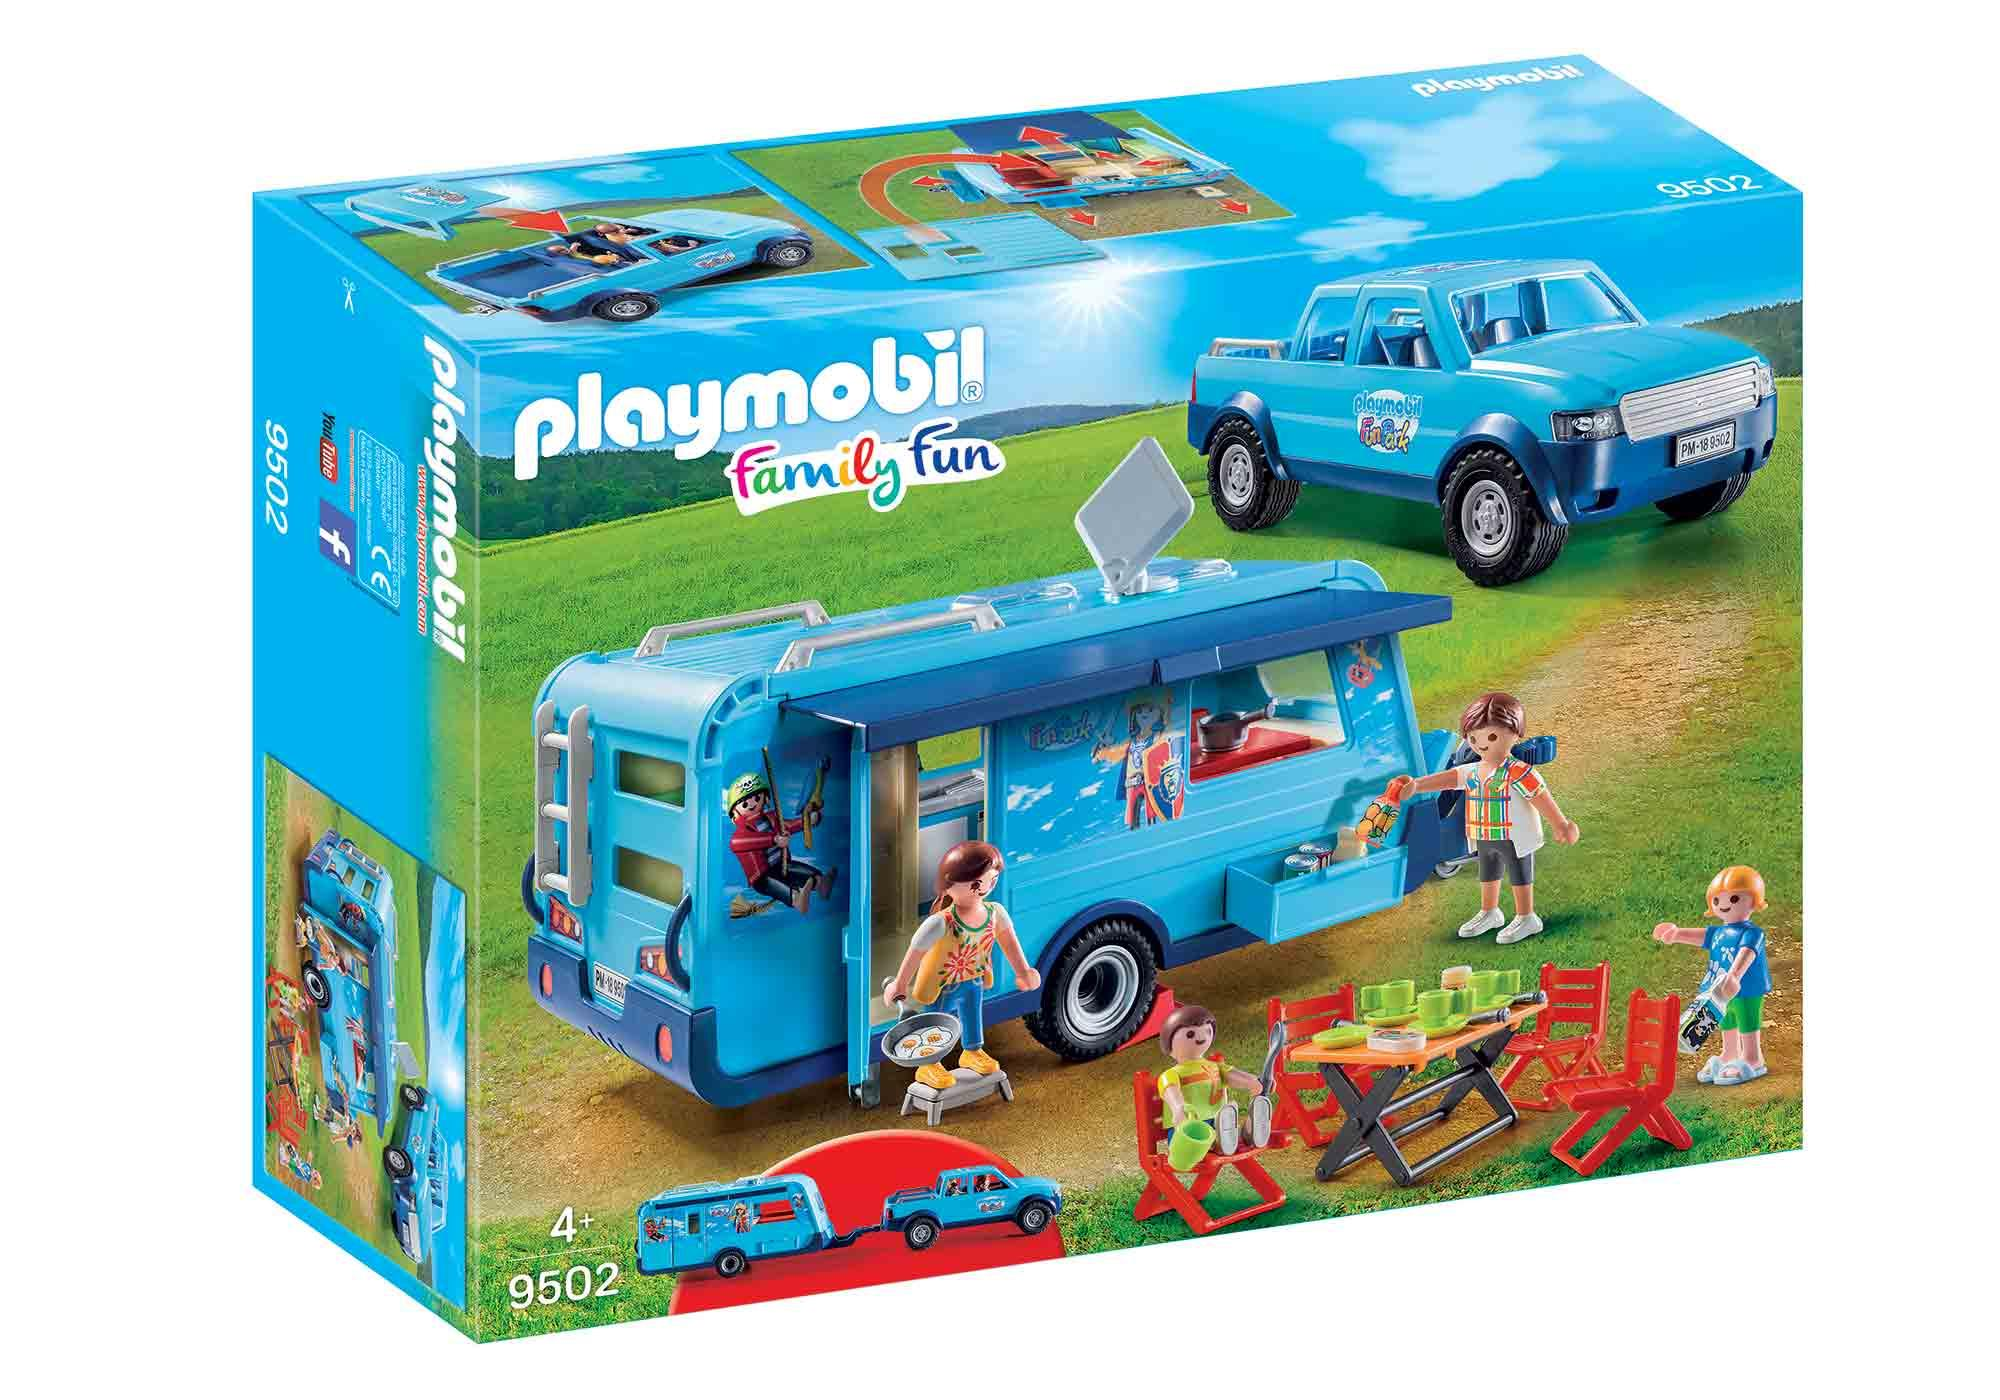 http://media.playmobil.com/i/playmobil/9502_product_box_front/PLAYMOBIL-FunPark pickup med campingvogn